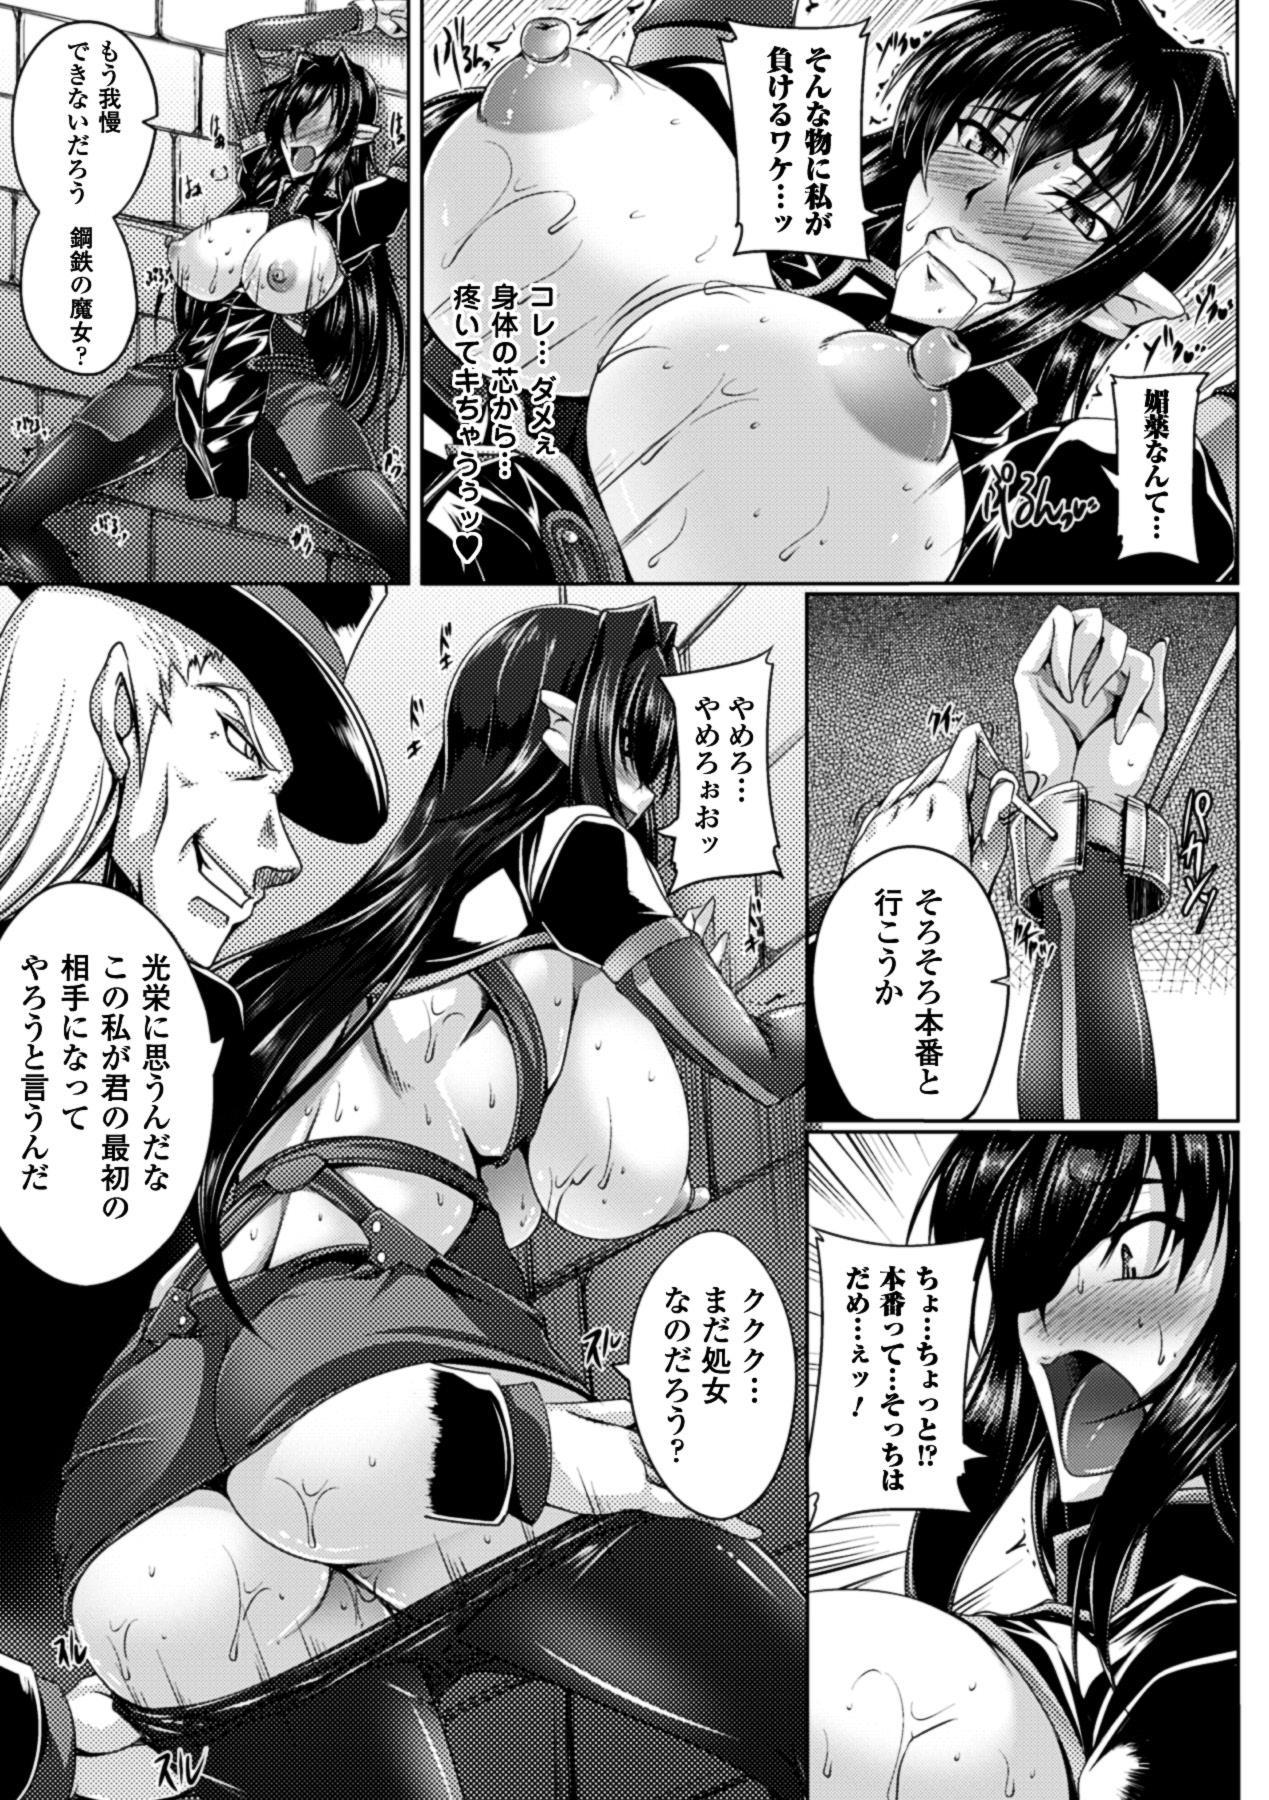 Megami Crisis 10 16